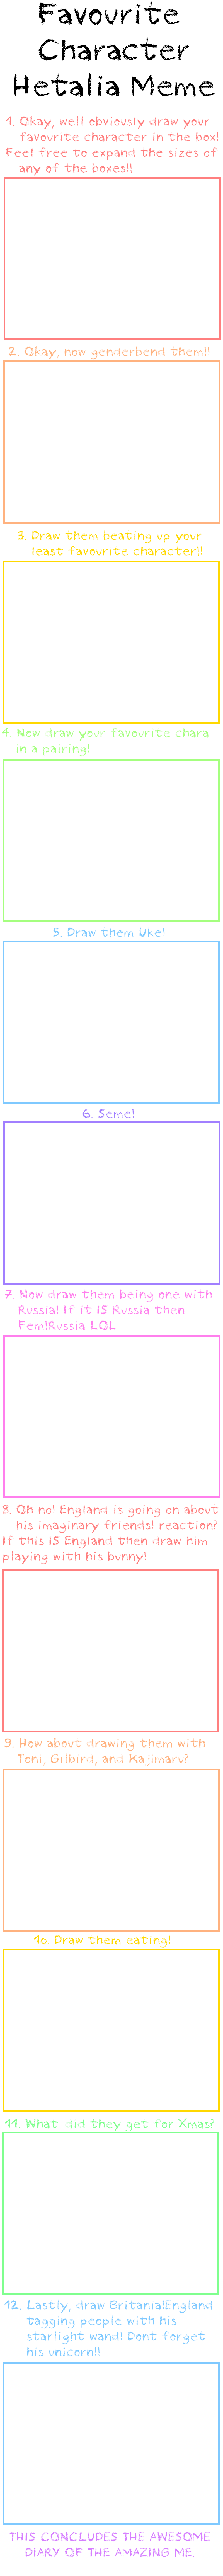 Favourite Hetalia Chara Meme by xXimmaeatjooXx